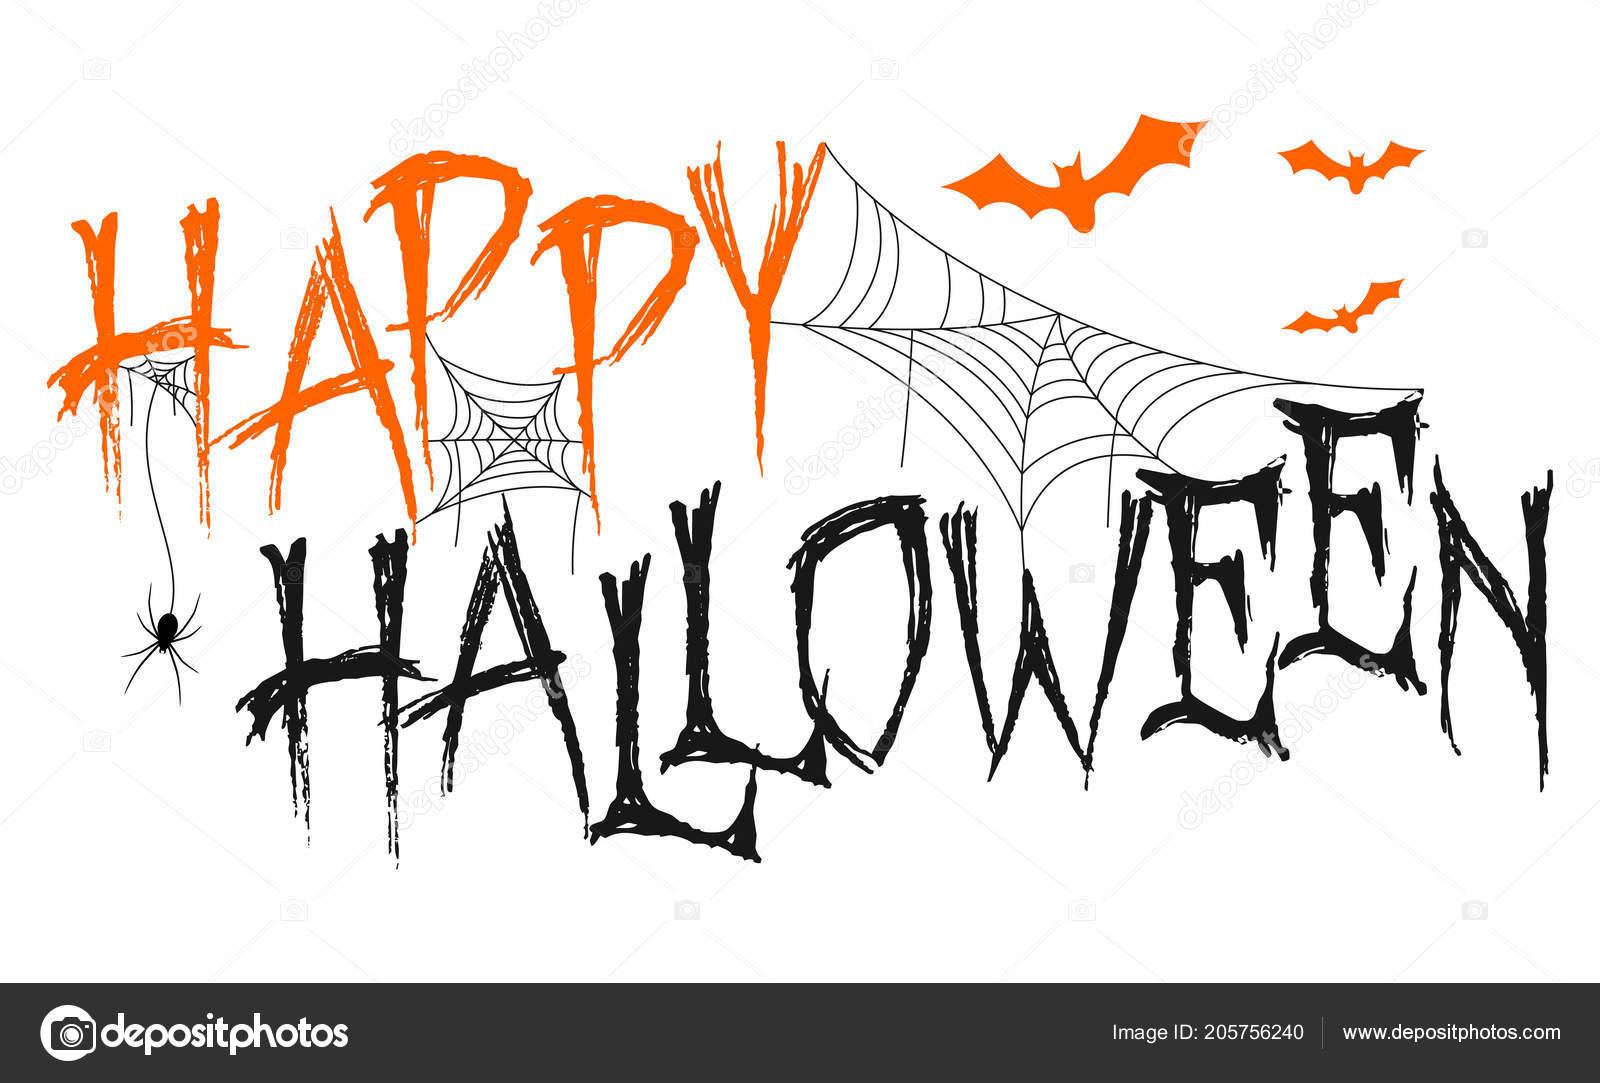 Happy Halloween Lettering Spider Web Bats Stock Vector C Dreamcreation01 205756240